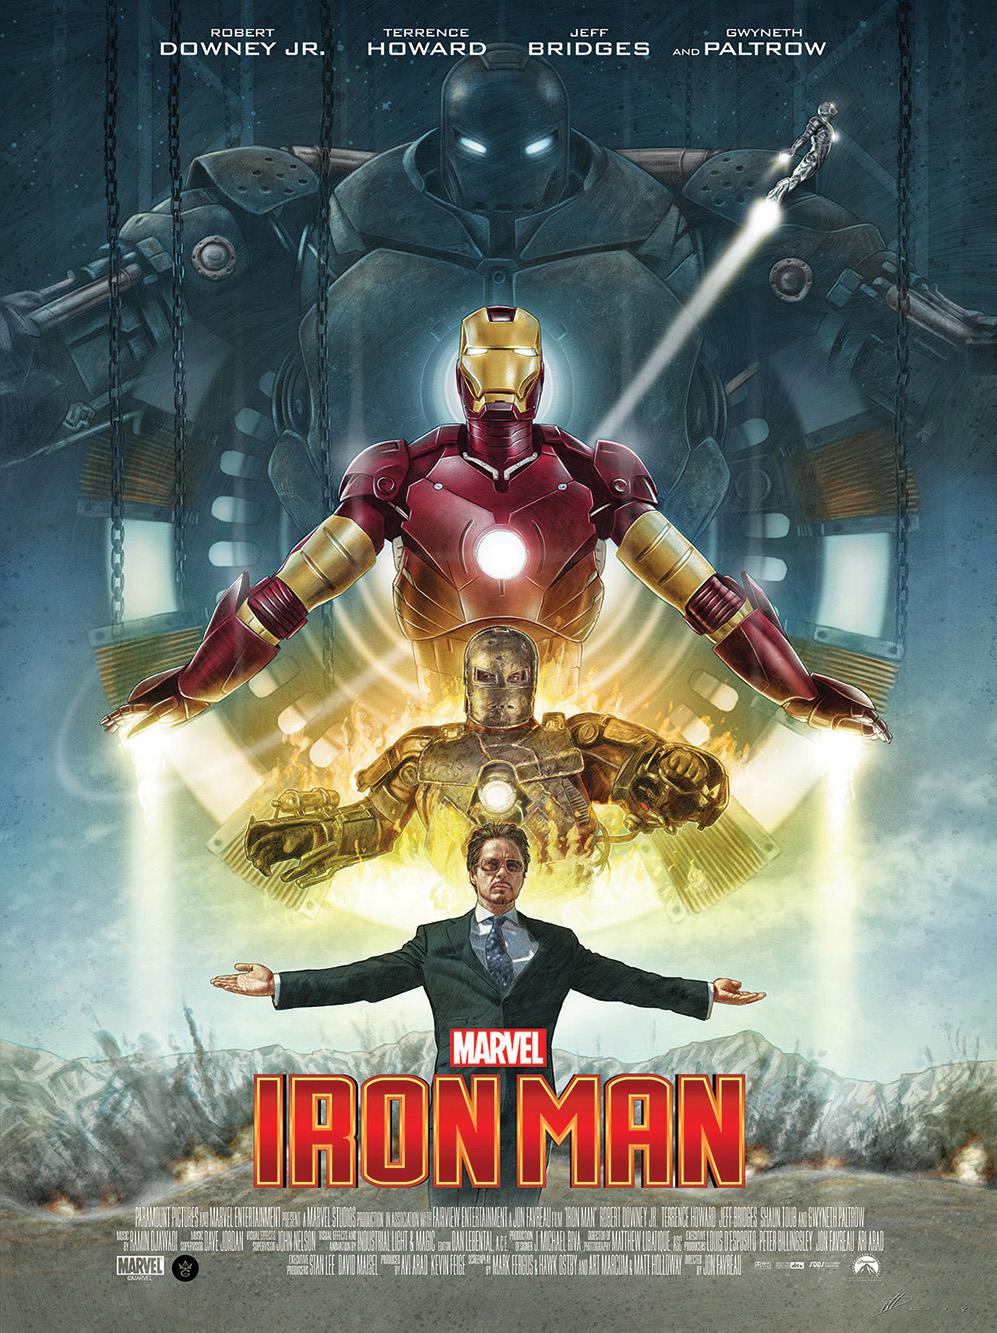 Iron Man 10th Anniversary alternative movie poster - PosterSpy